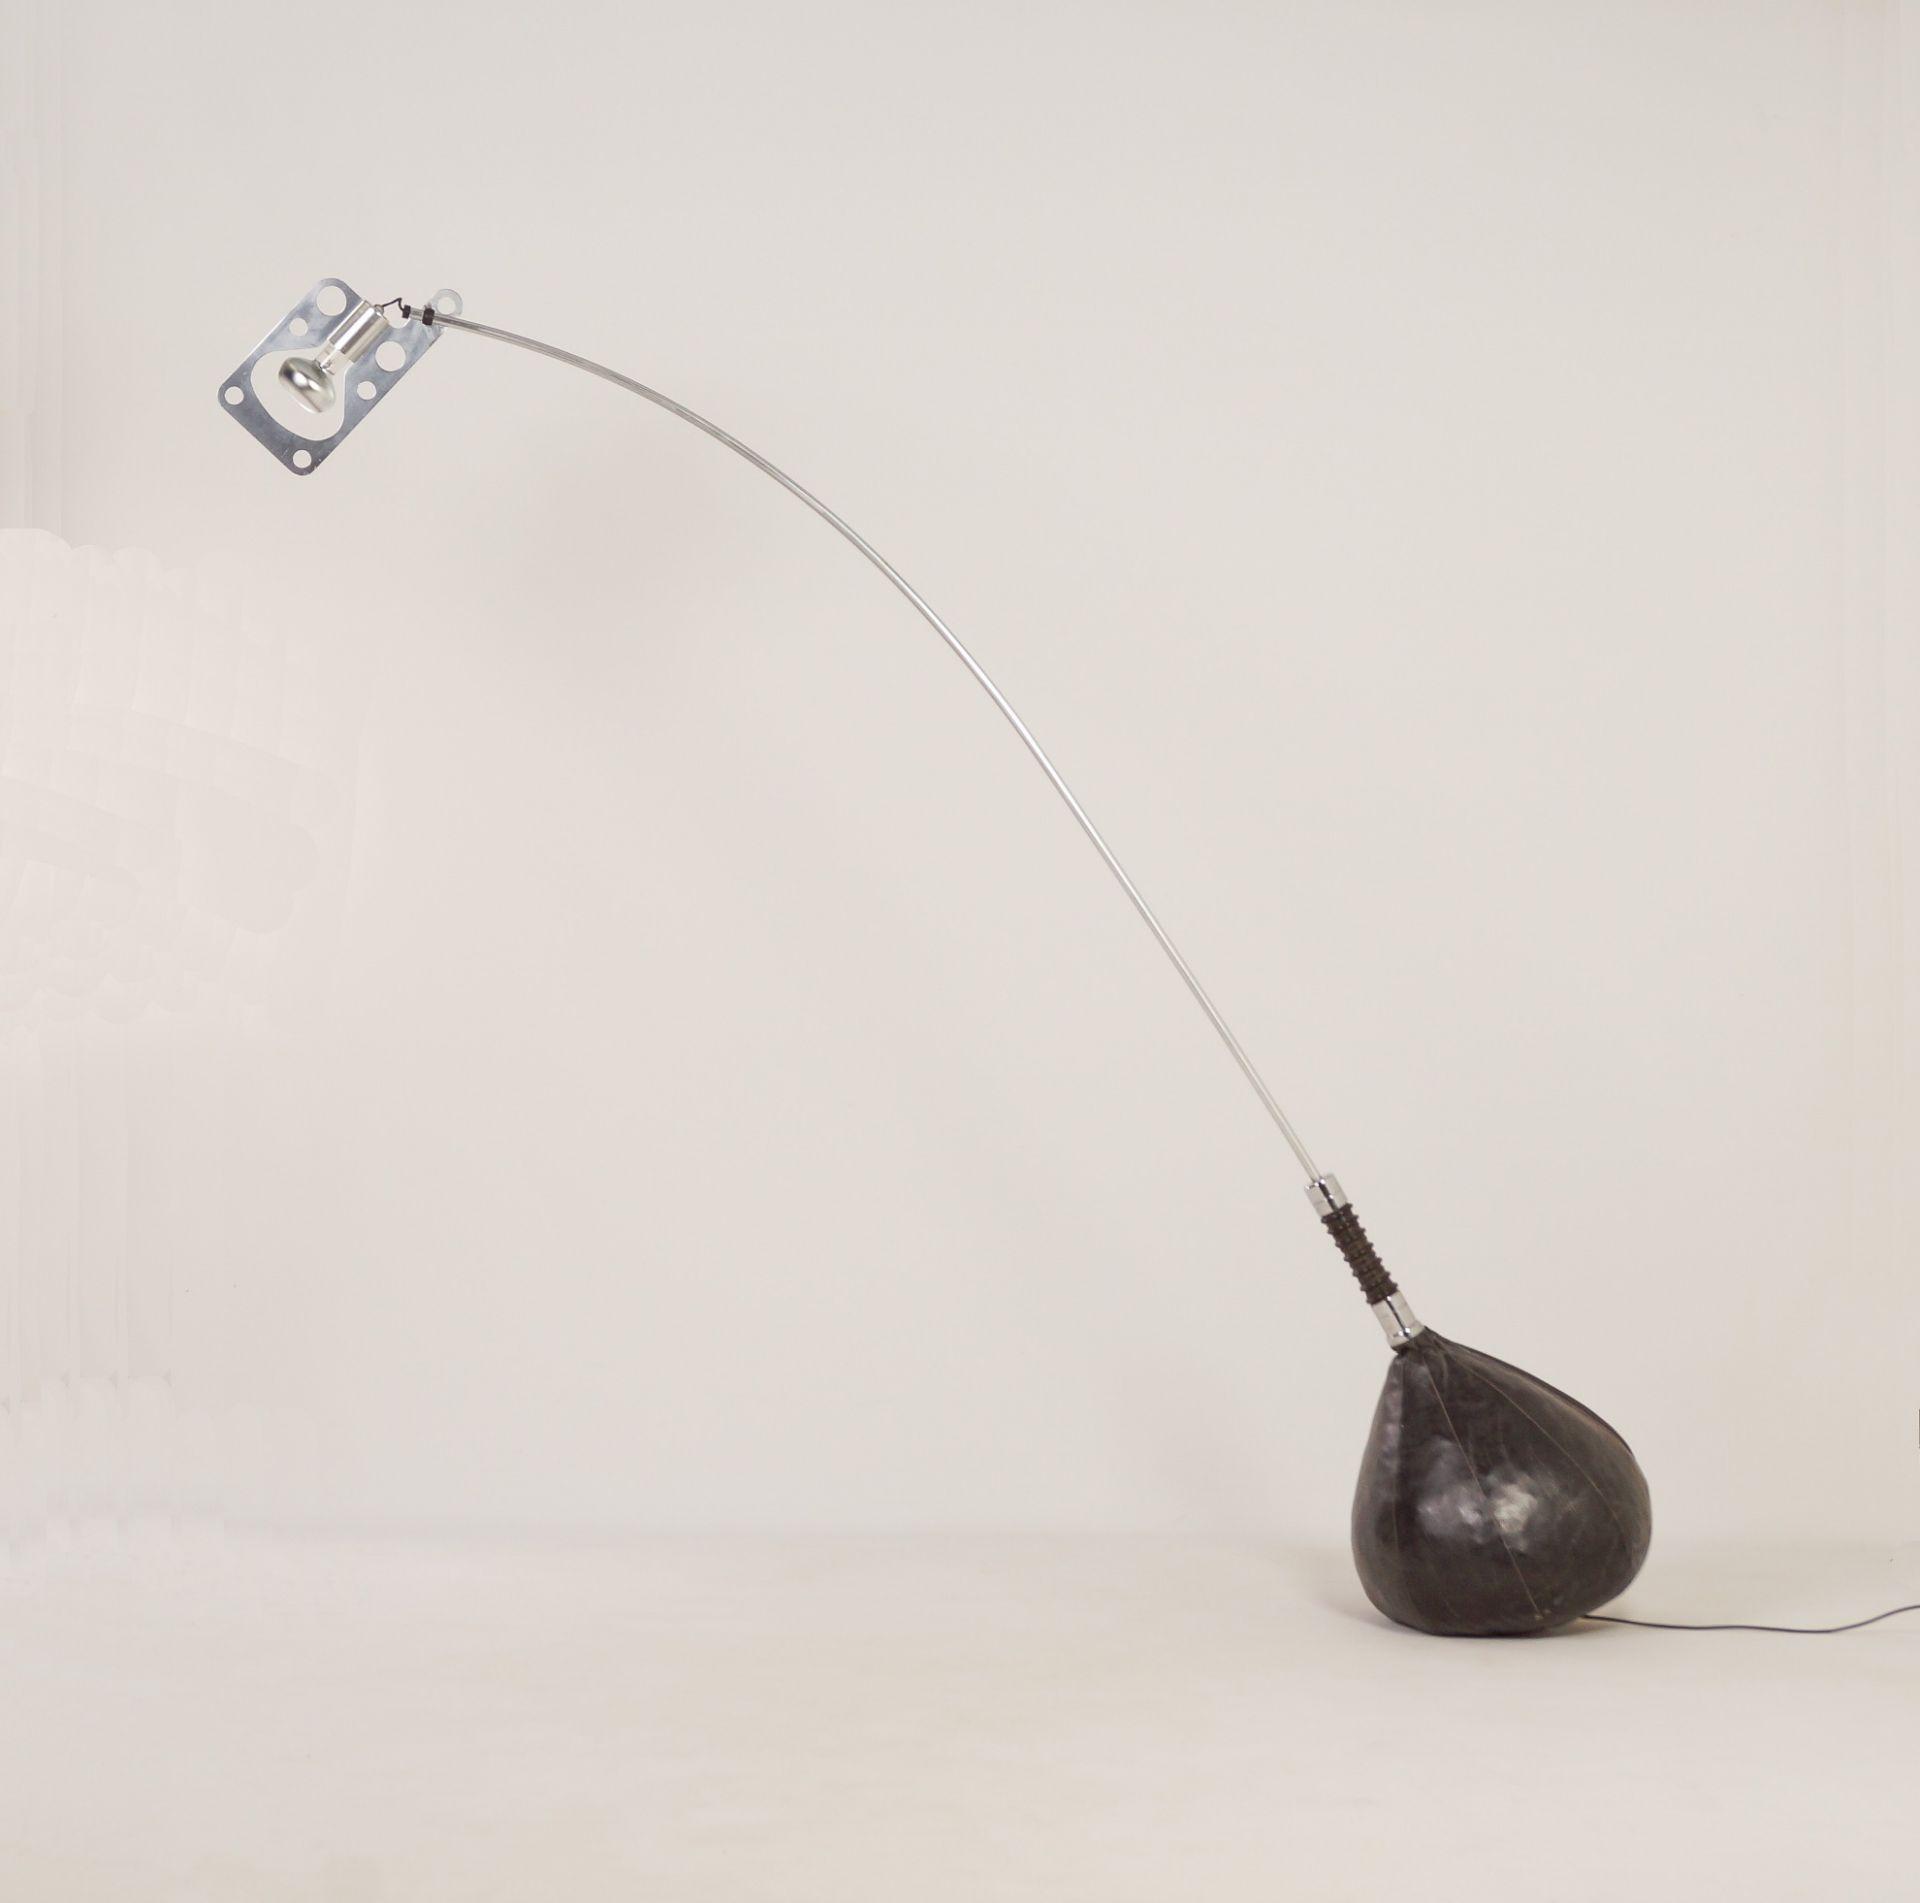 Bul-Bo floor lamp by Roberto Gabetti & Aimaro Isola for Linea GB Milano, 1969